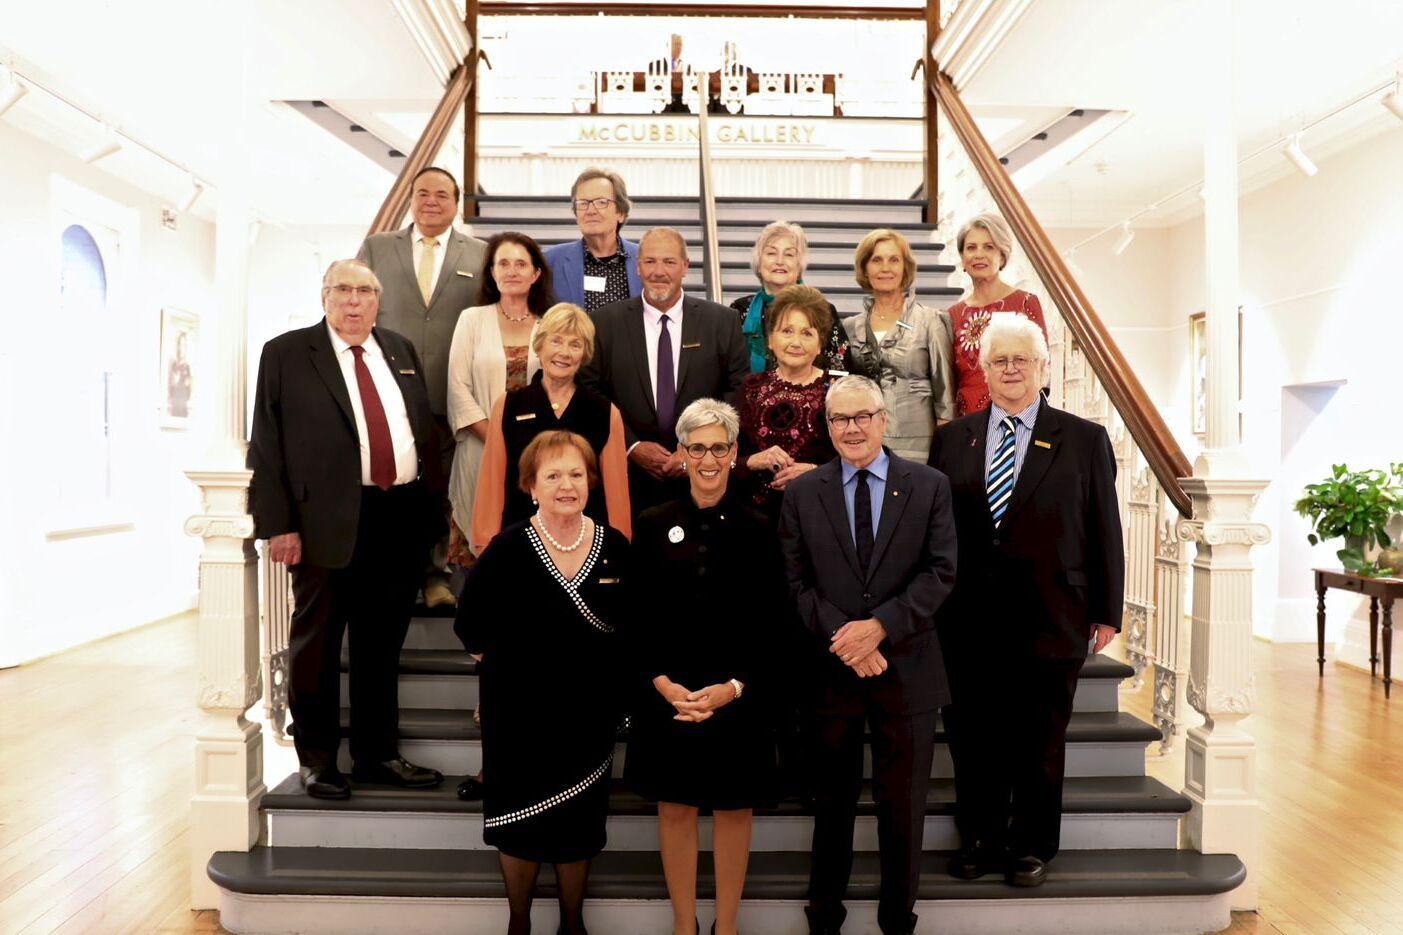 VAS council at anniversary event